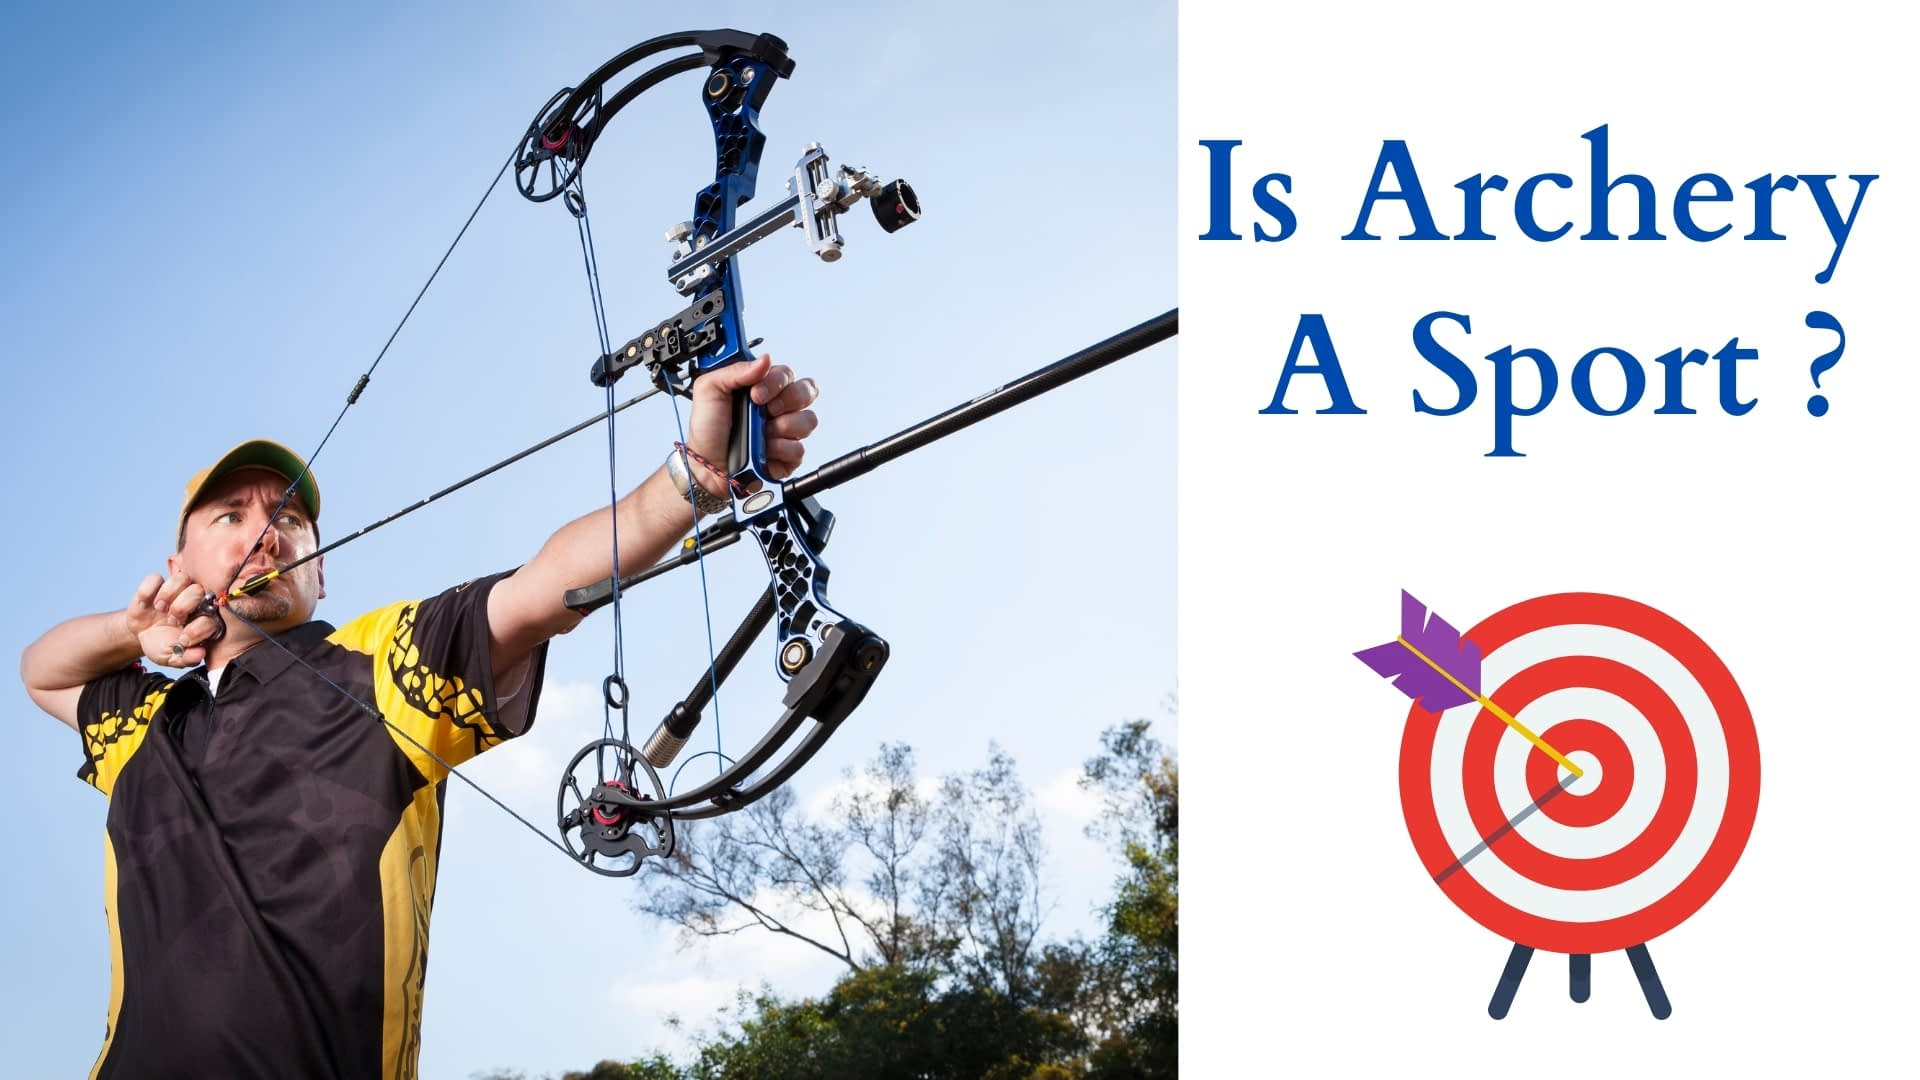 Is Archery a Sport